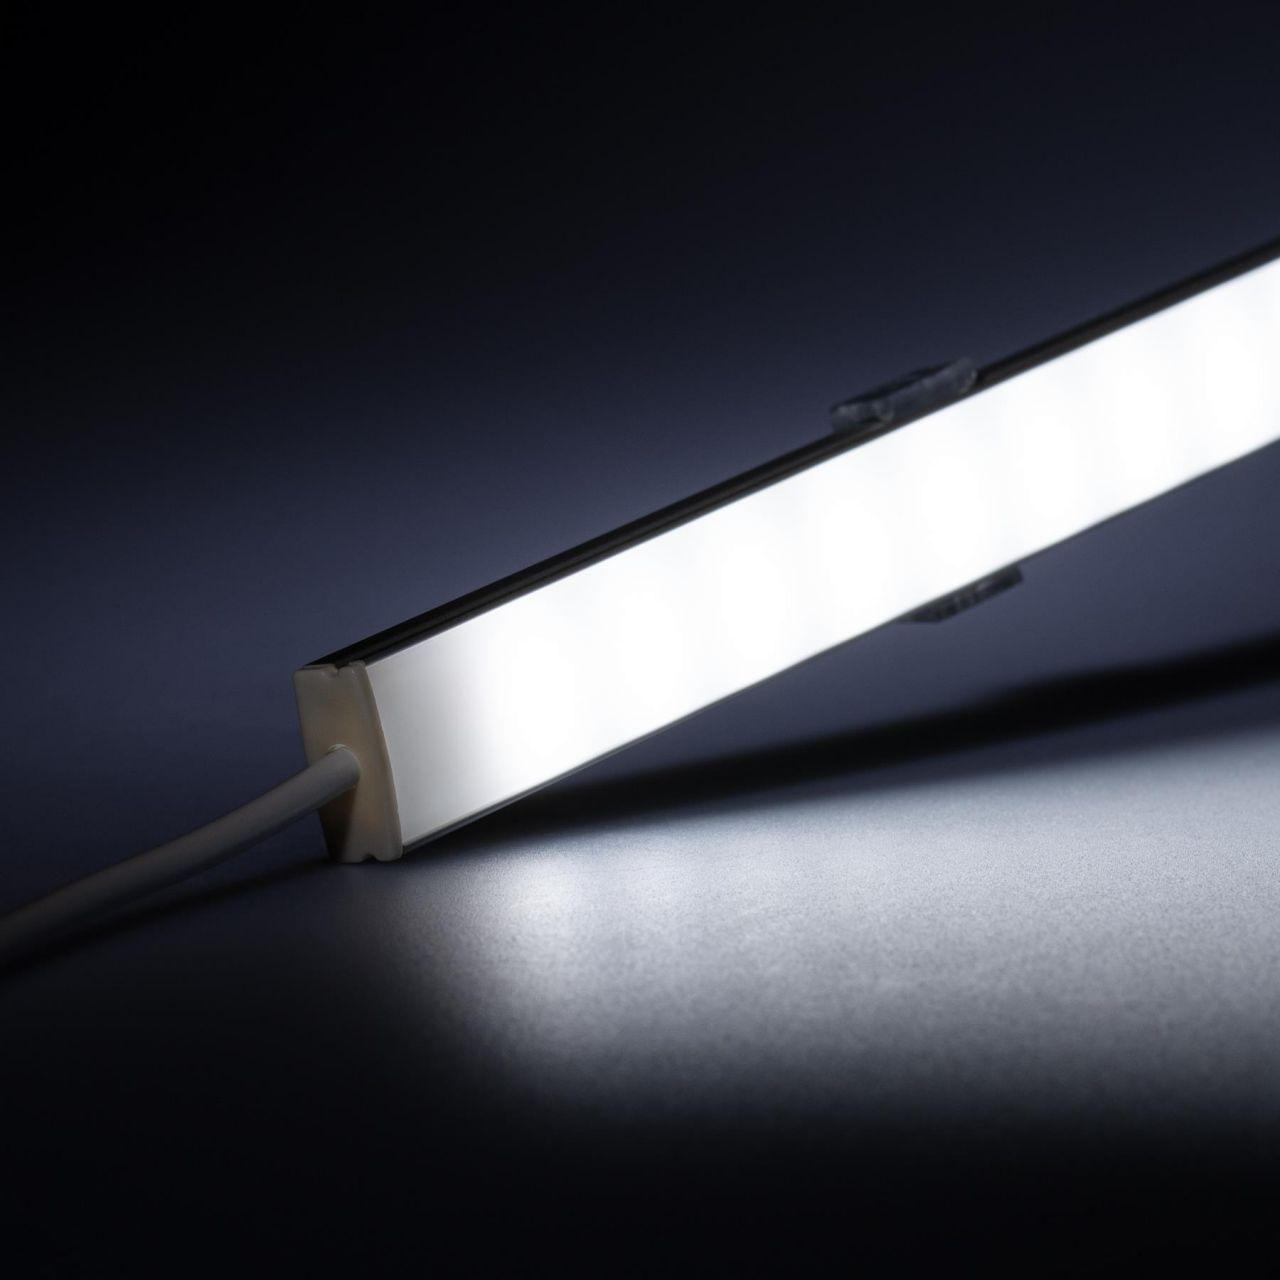 12V Slim Line Aluminium LED Leiste – weiß – diffuse Abdeckung